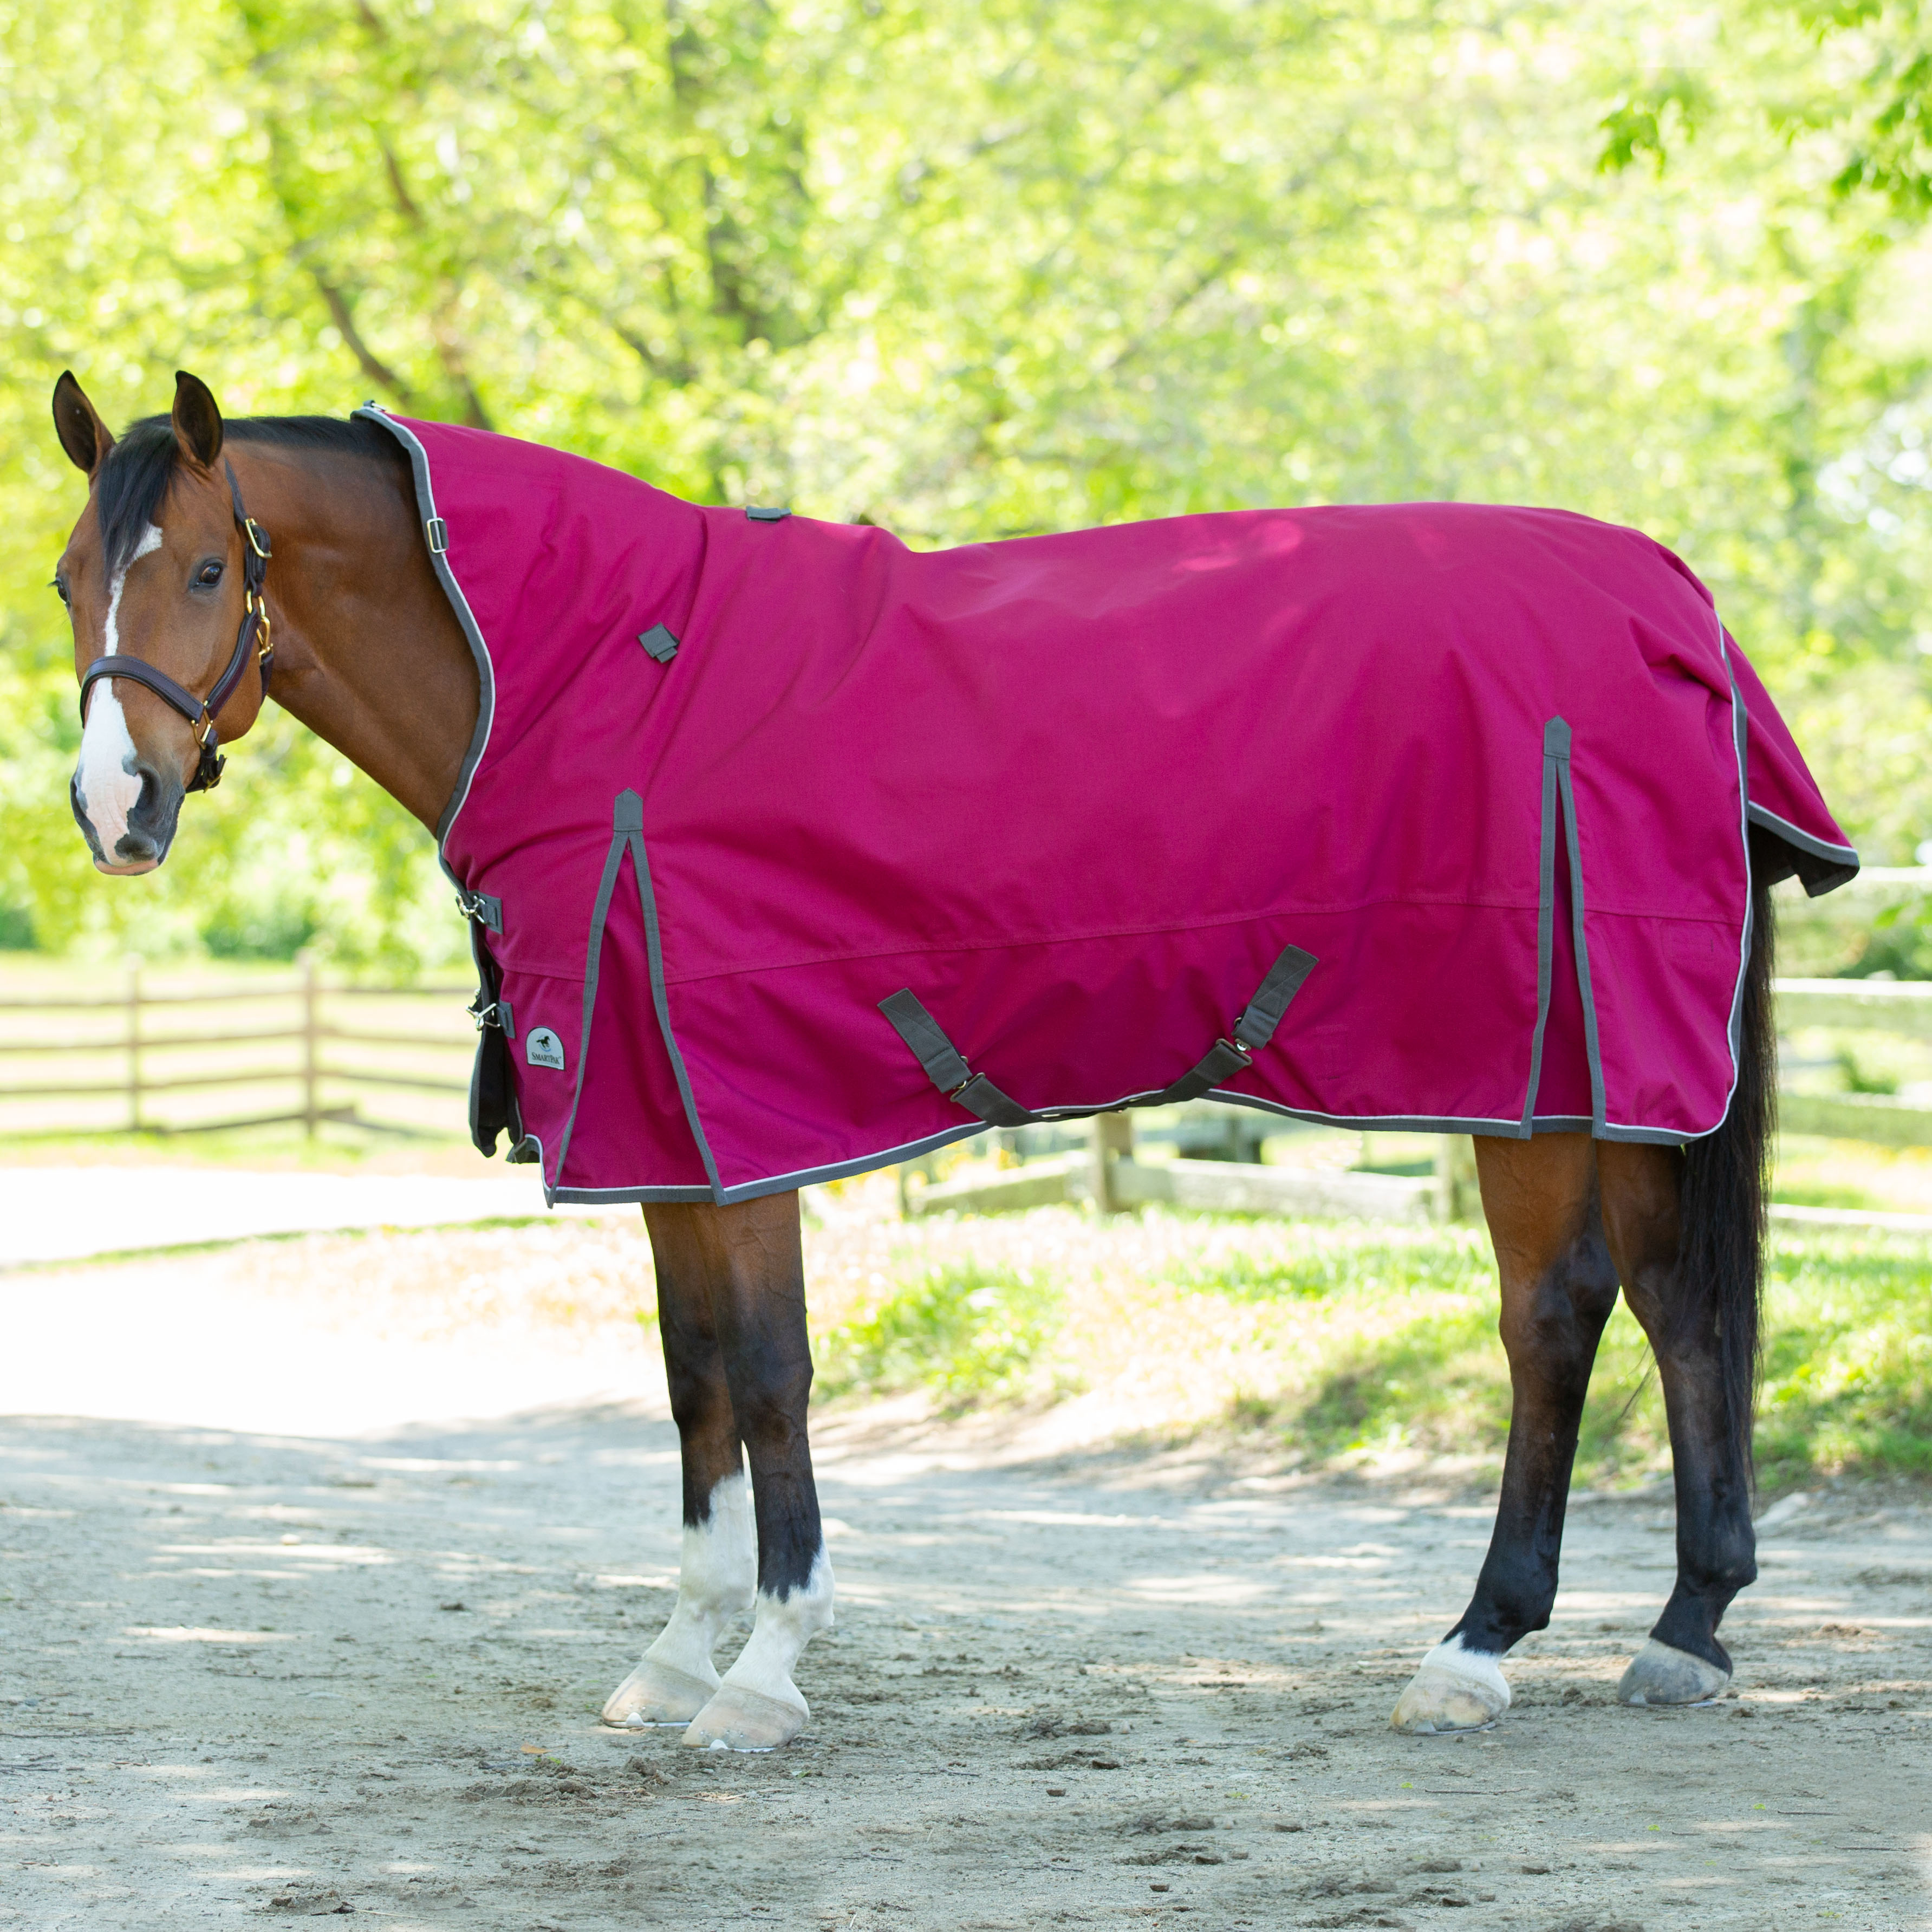 Raspberry One Size Fleece Neck Warmer Fleece Neck Warmer Shires